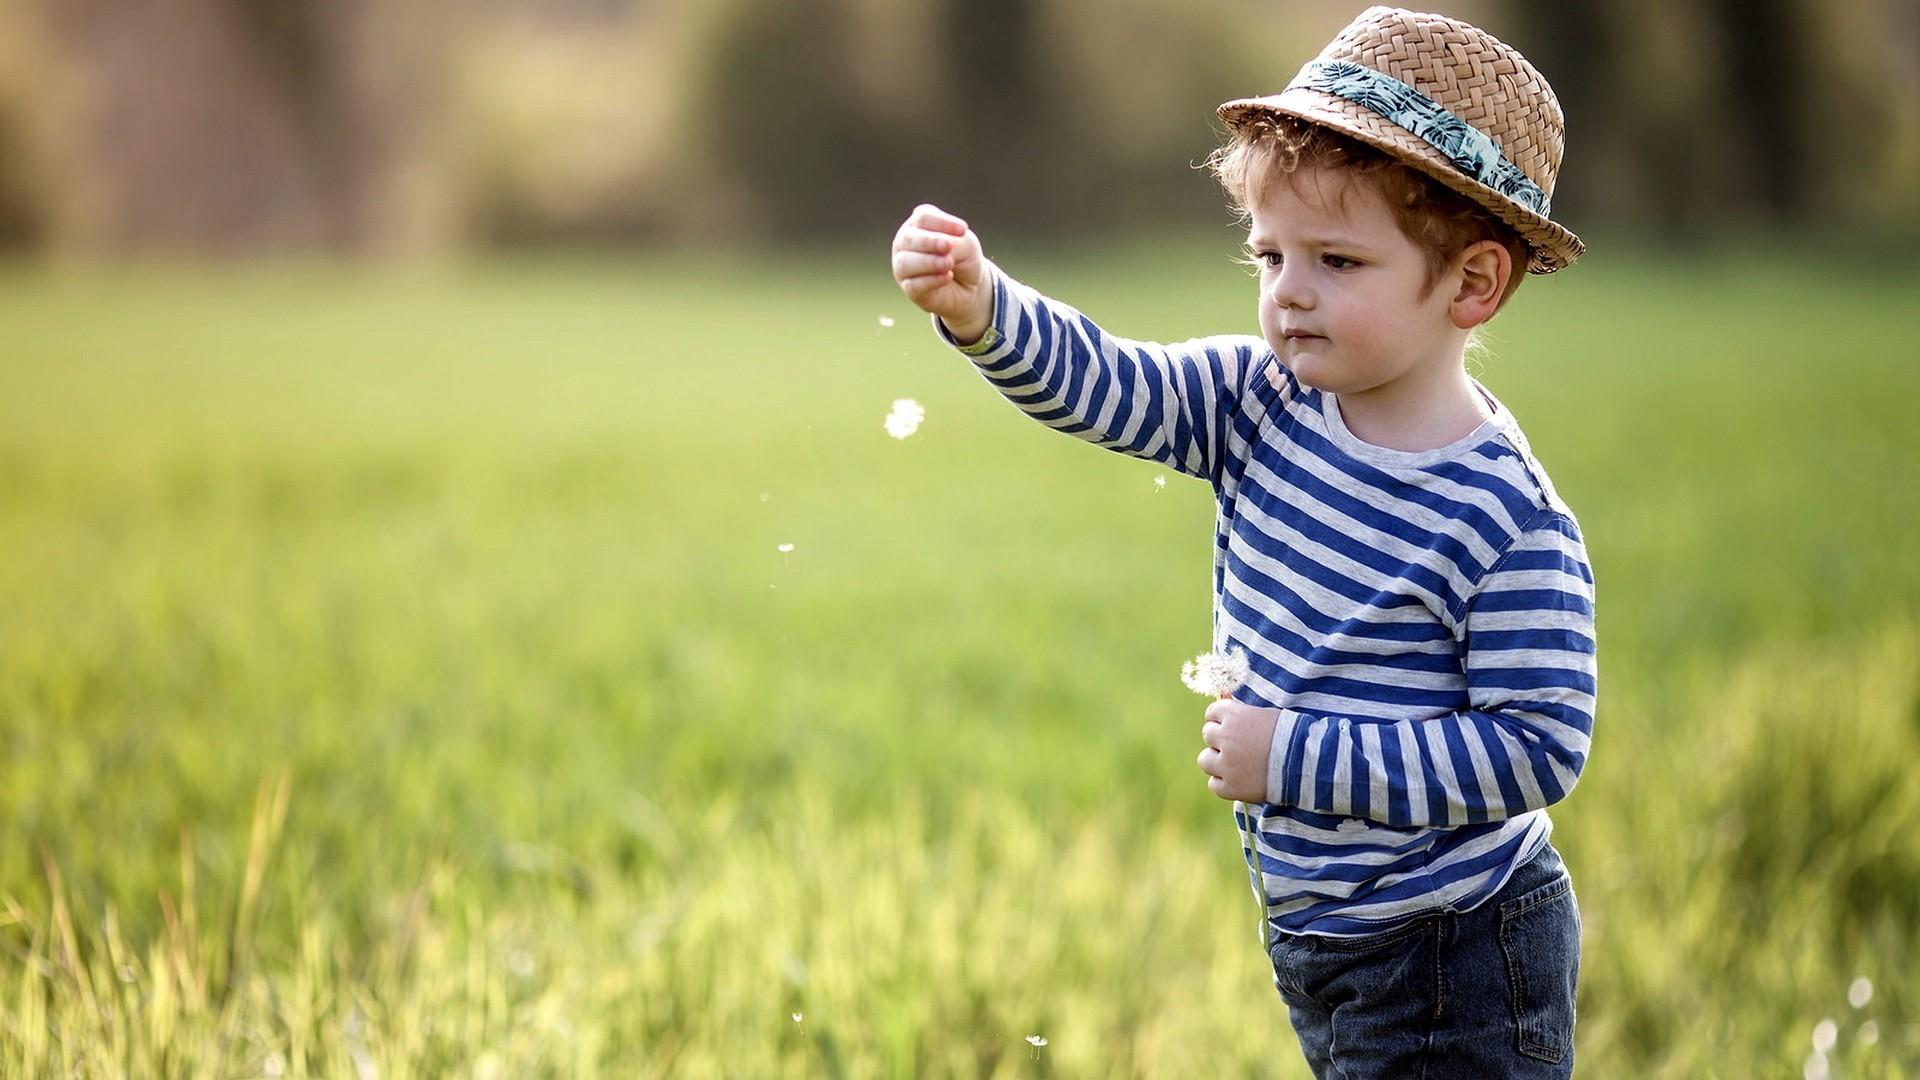 بالصور صور اولاد حلوين , شاهد بالصور اجمل الاطفال الاولاد 429 2